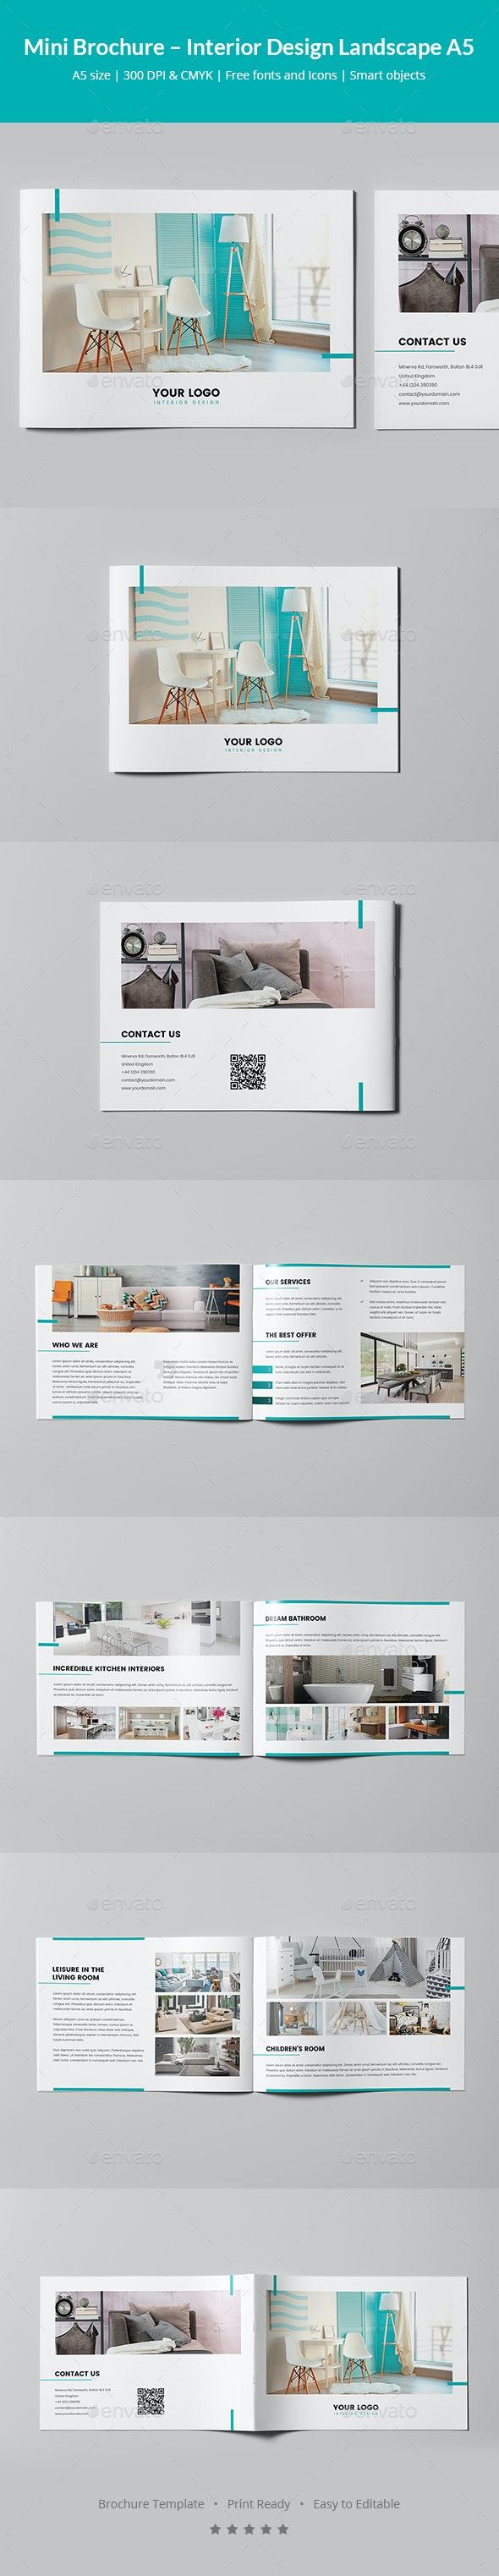 Mini Brochure – Interior Design Landscape A5 - Informational Brochures